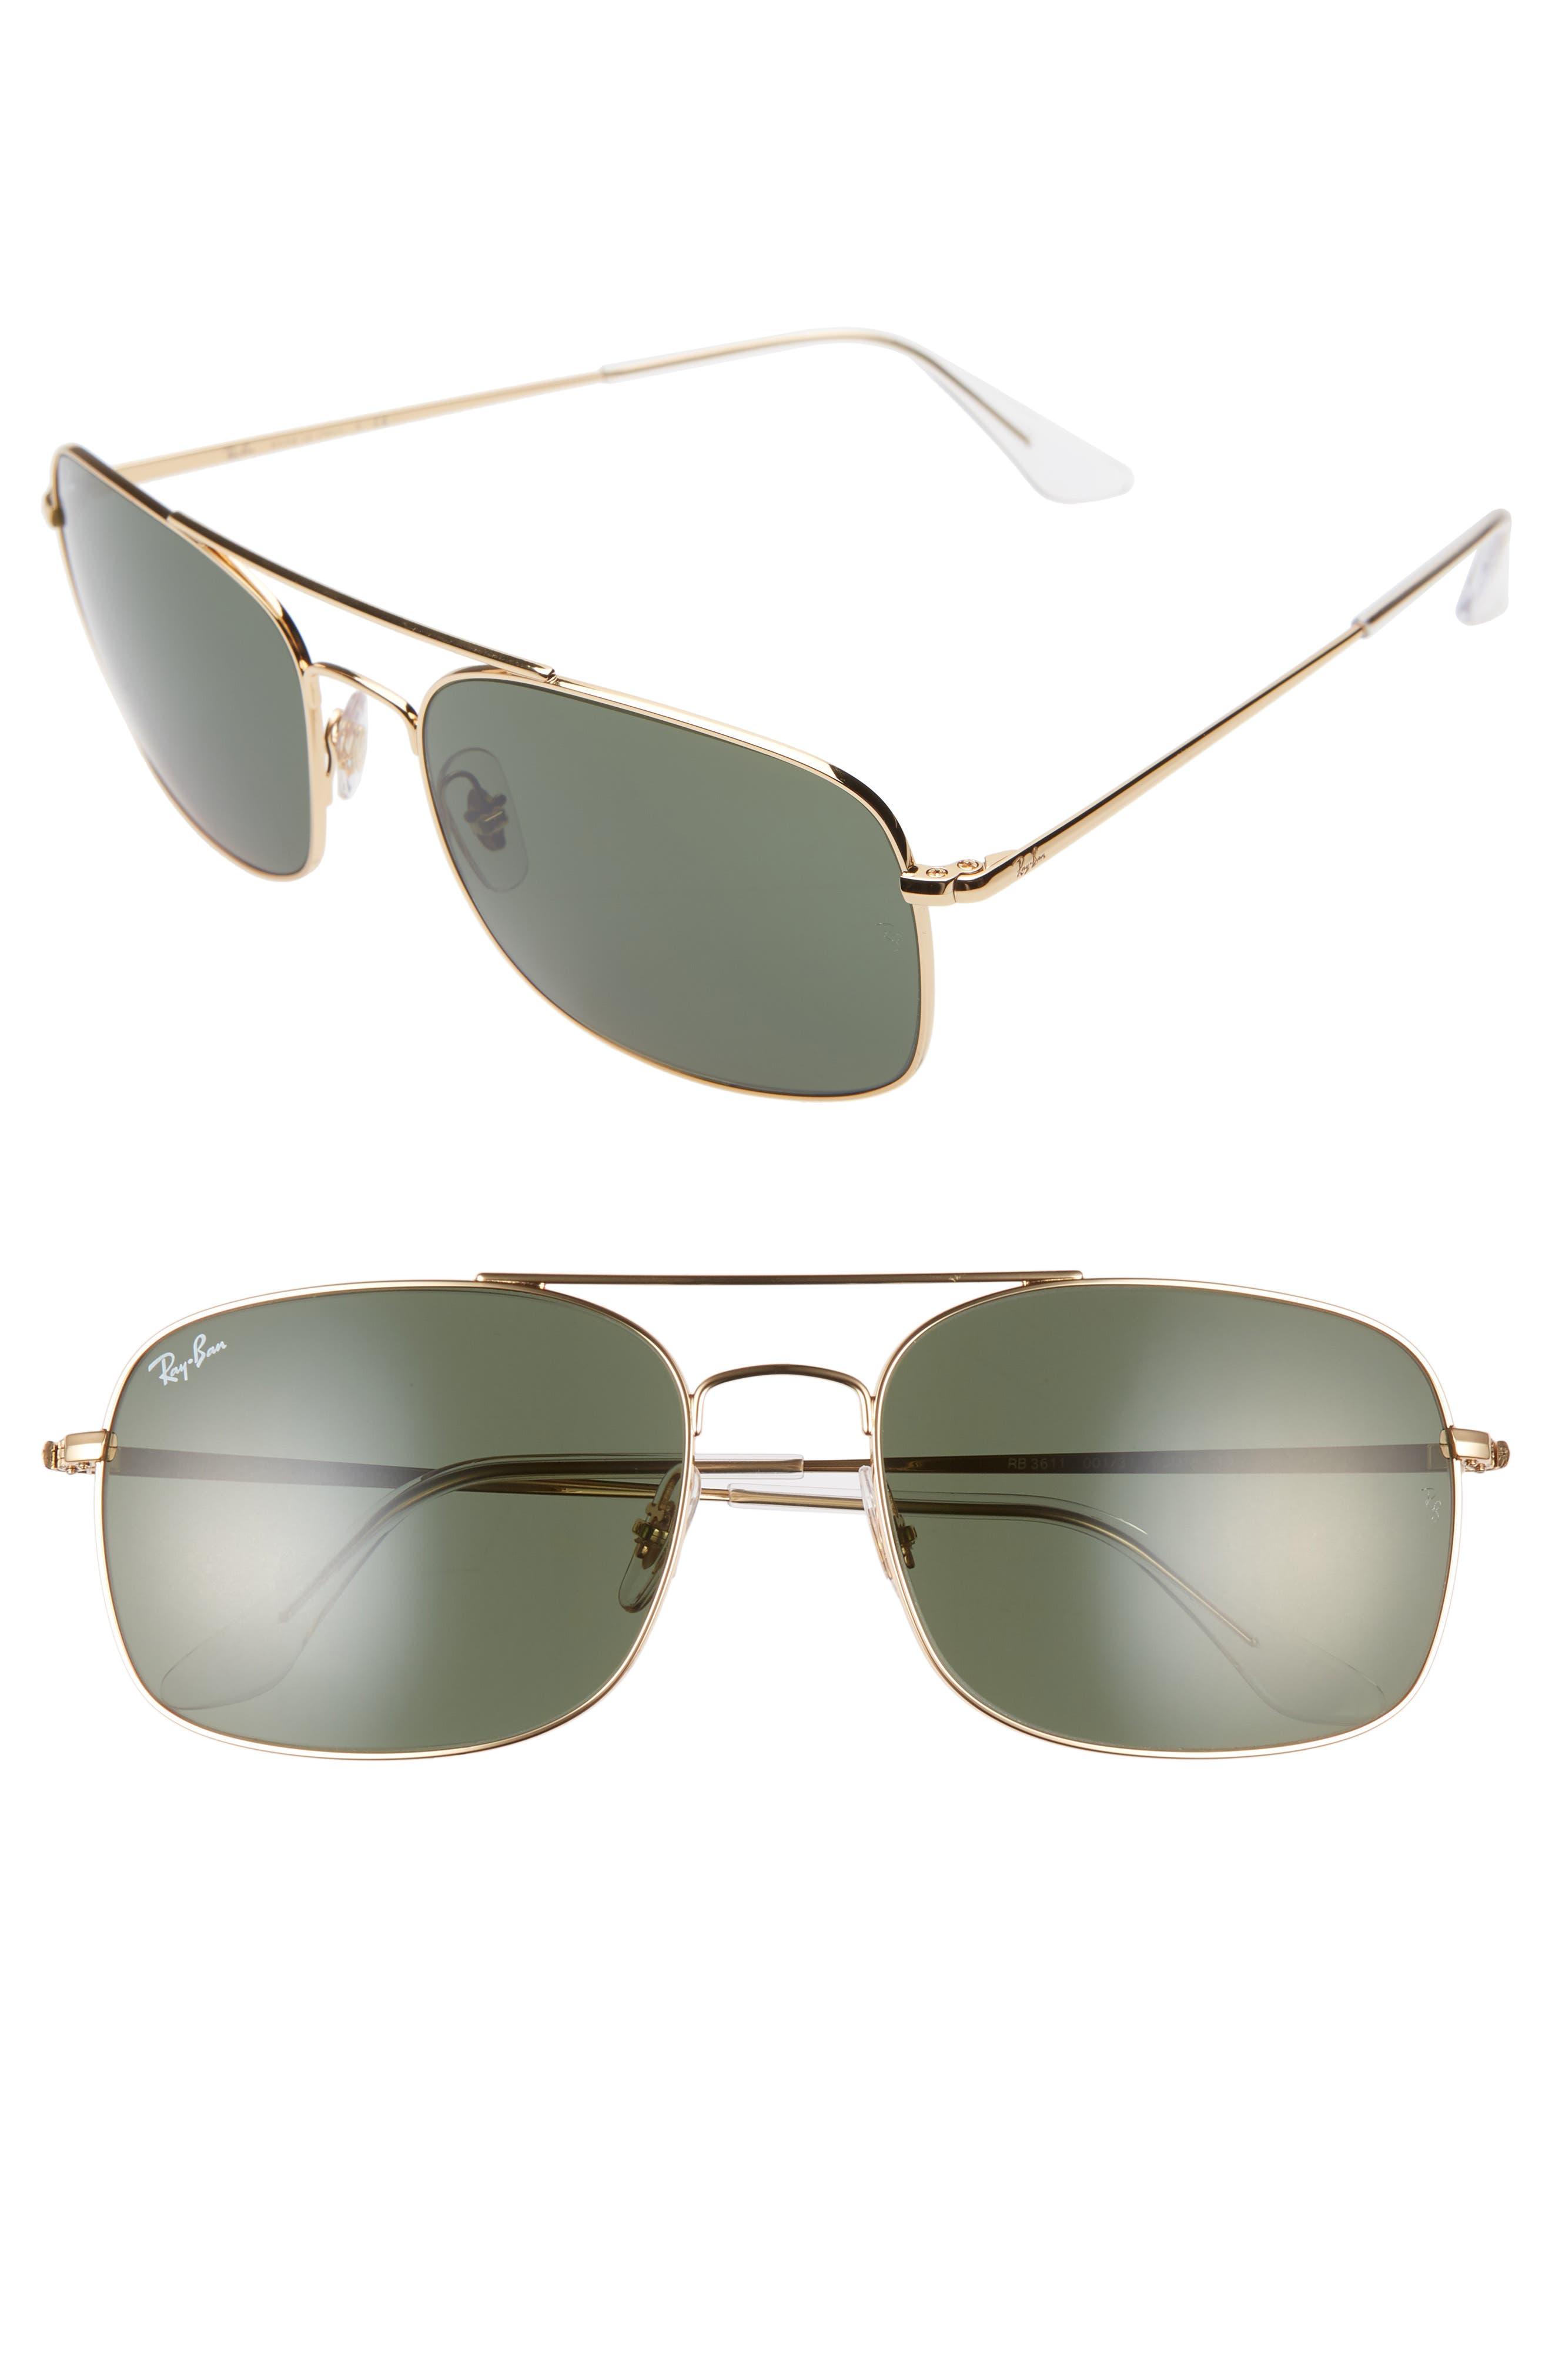 Ray-Ban 60Mm Aviator Sunglasses - Gold/ Green Solid